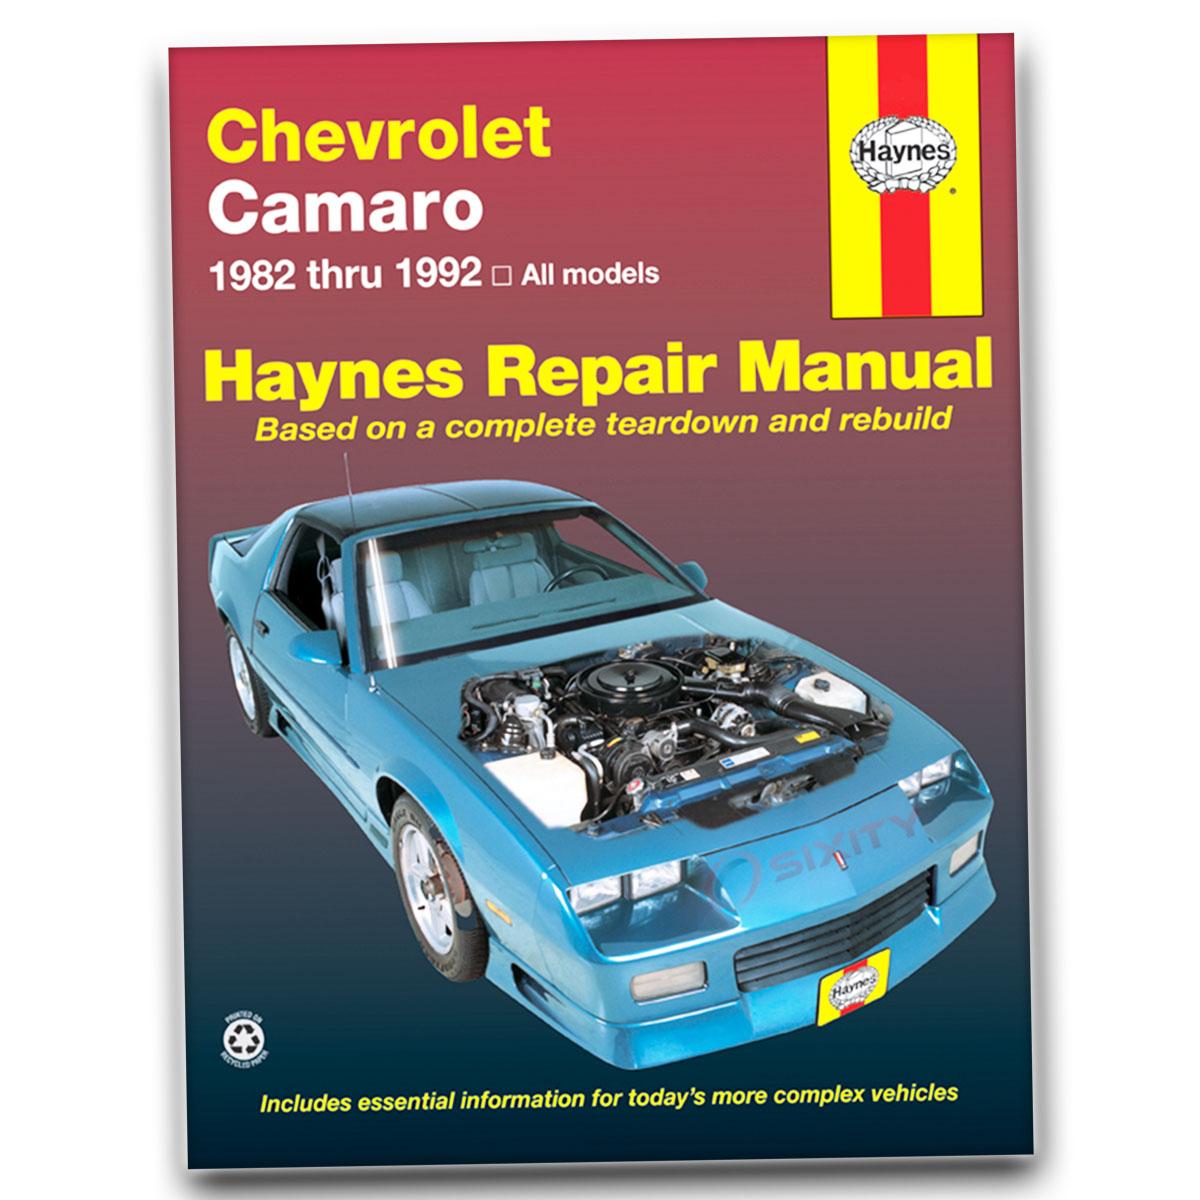 Haynes Repair Manual 24016 for Chevrolet Camaro 82-92 Shop Service Garage oi